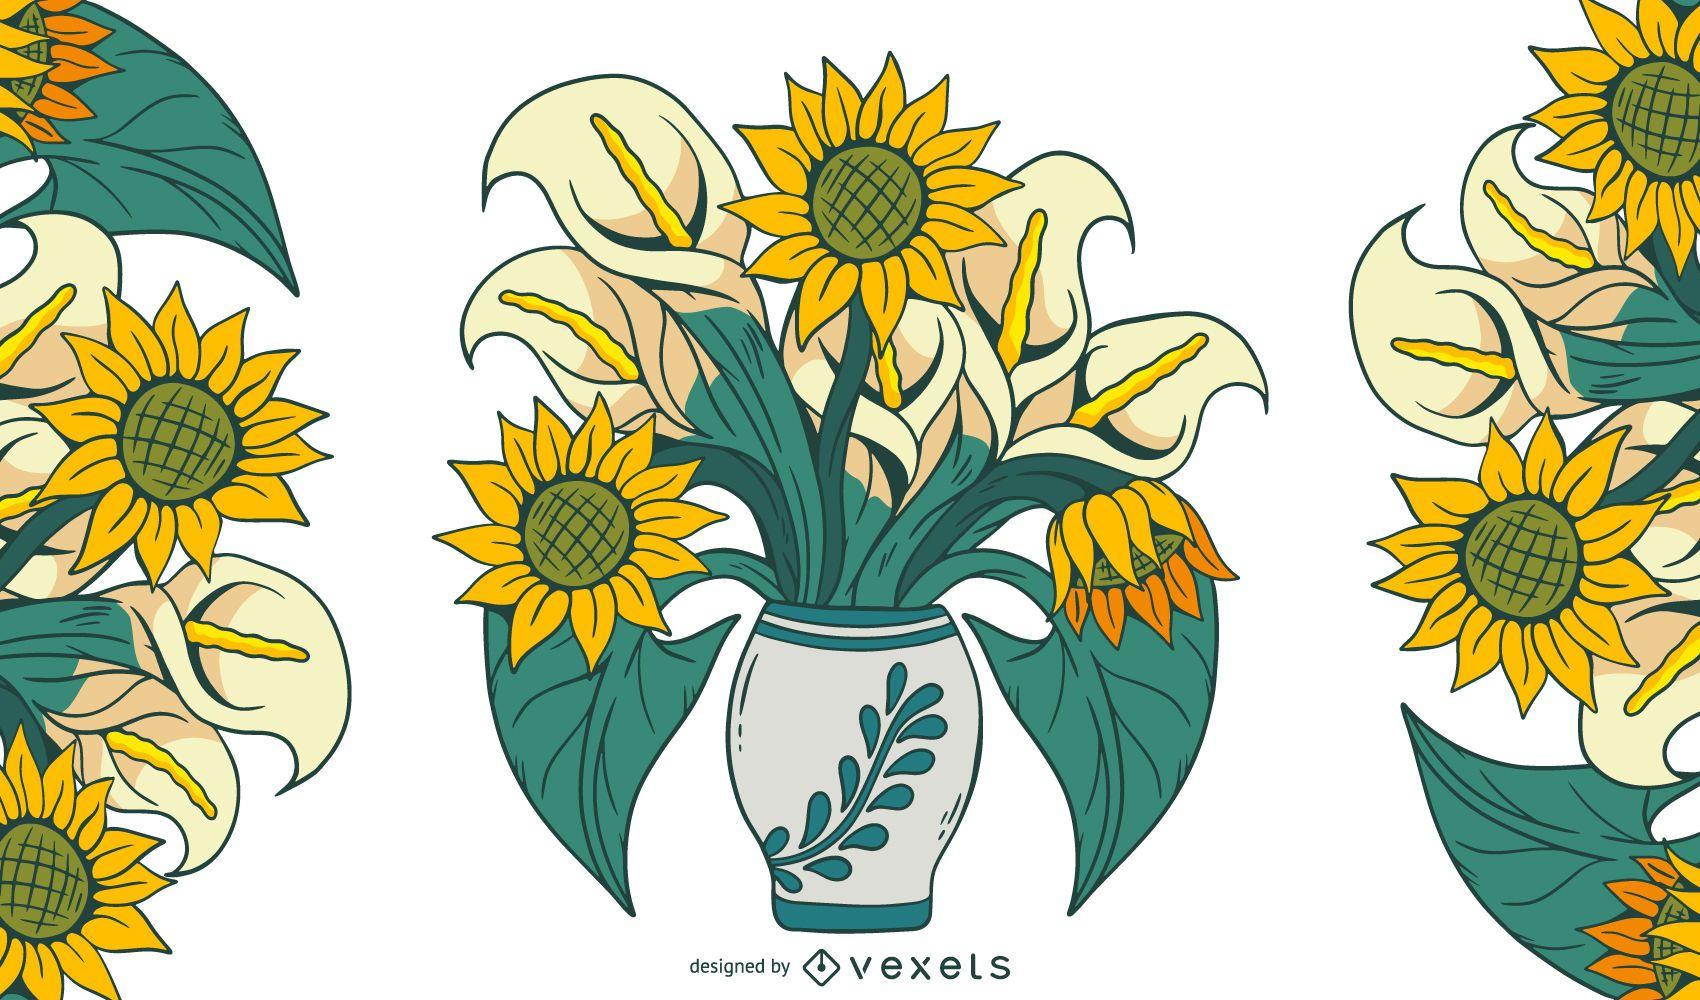 Sunflower arrangement illustration